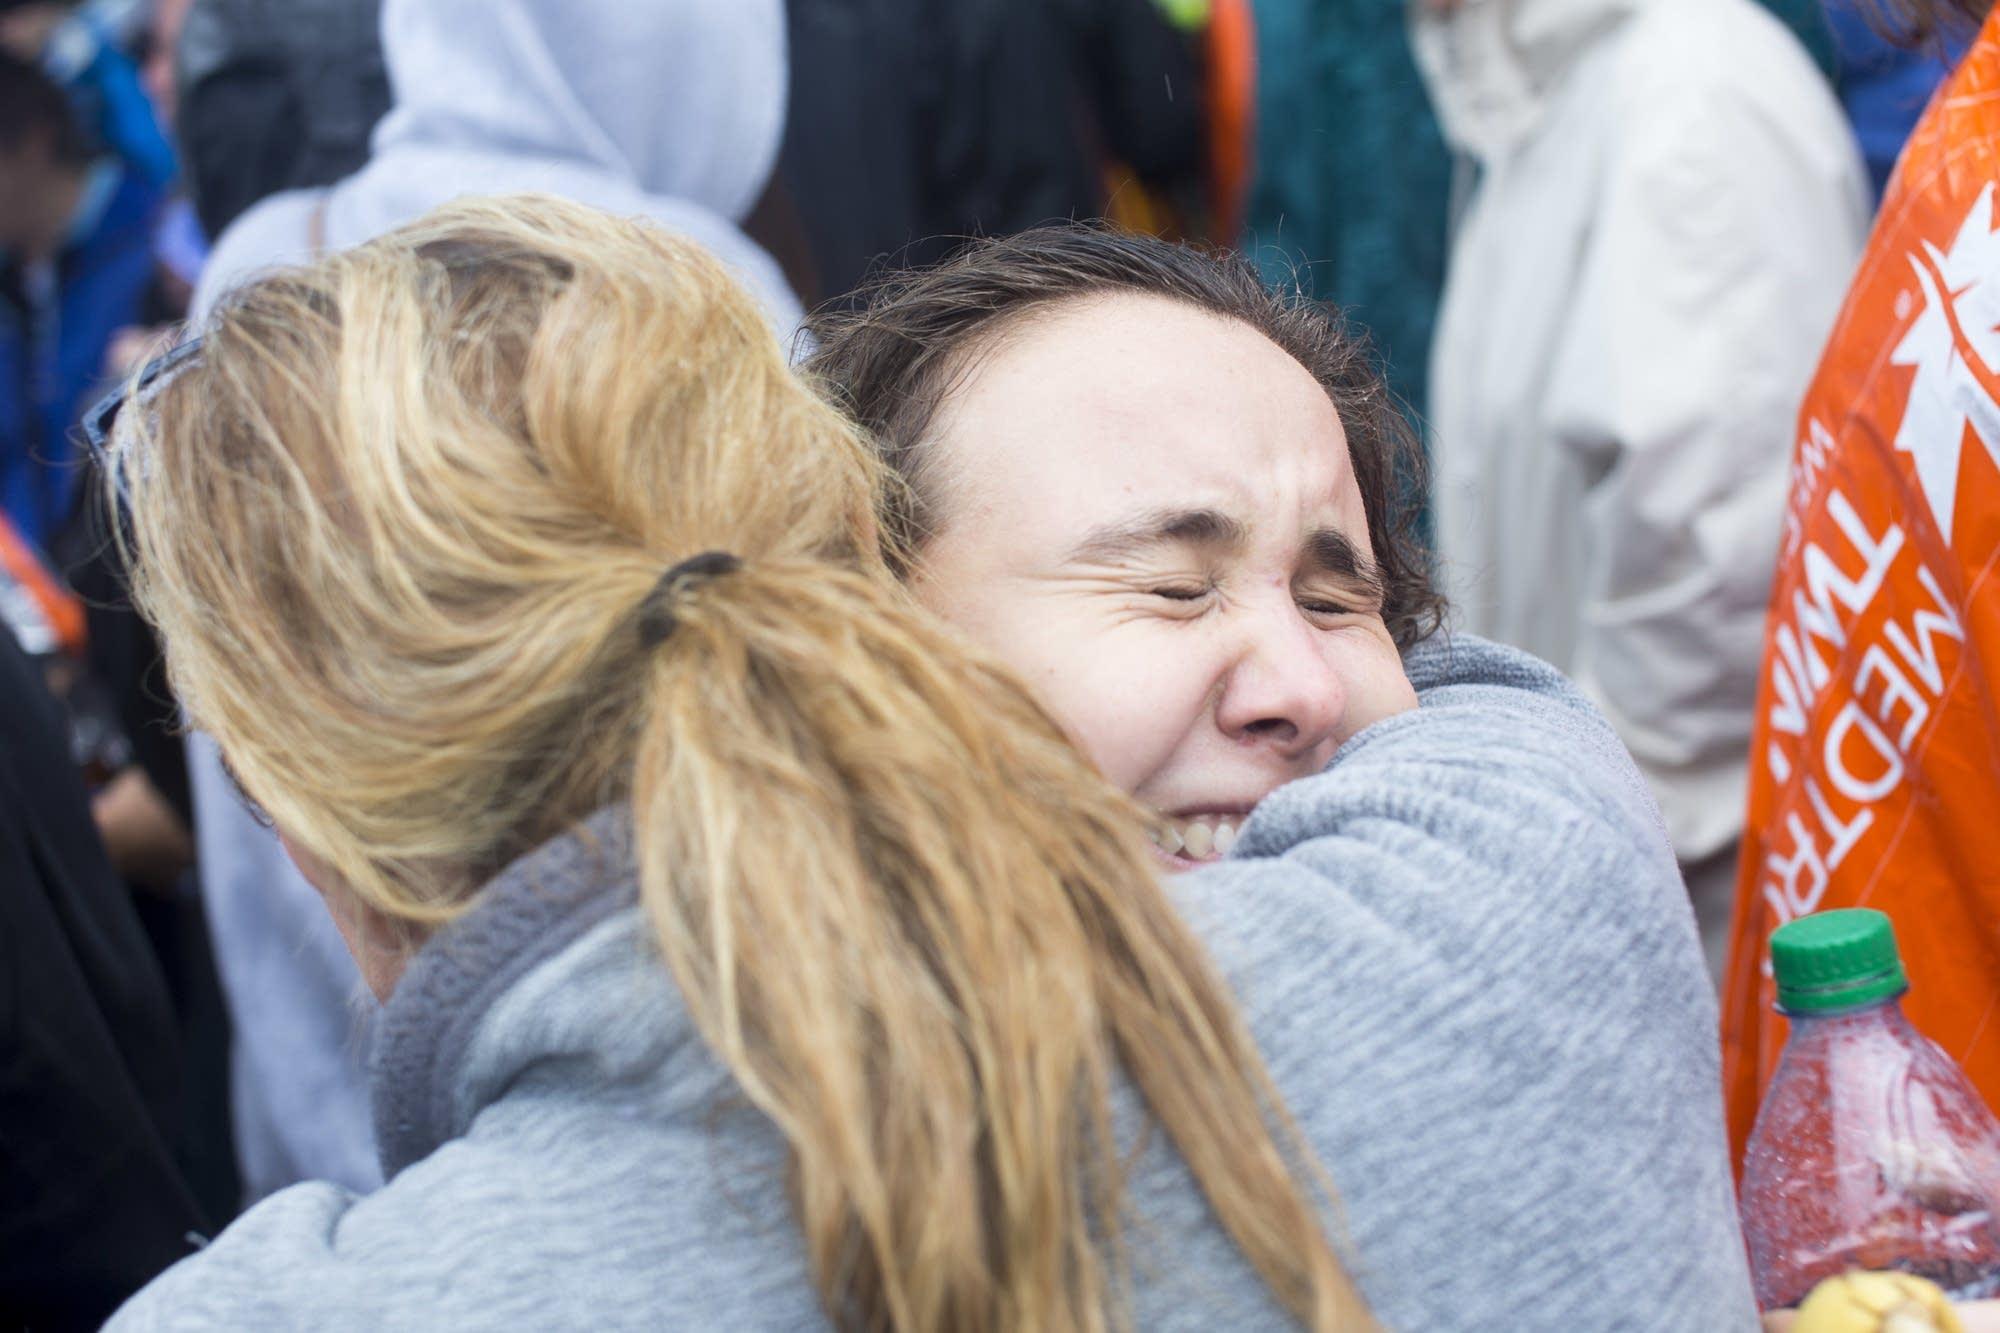 Rachel Hastings hugs her mother after the race.